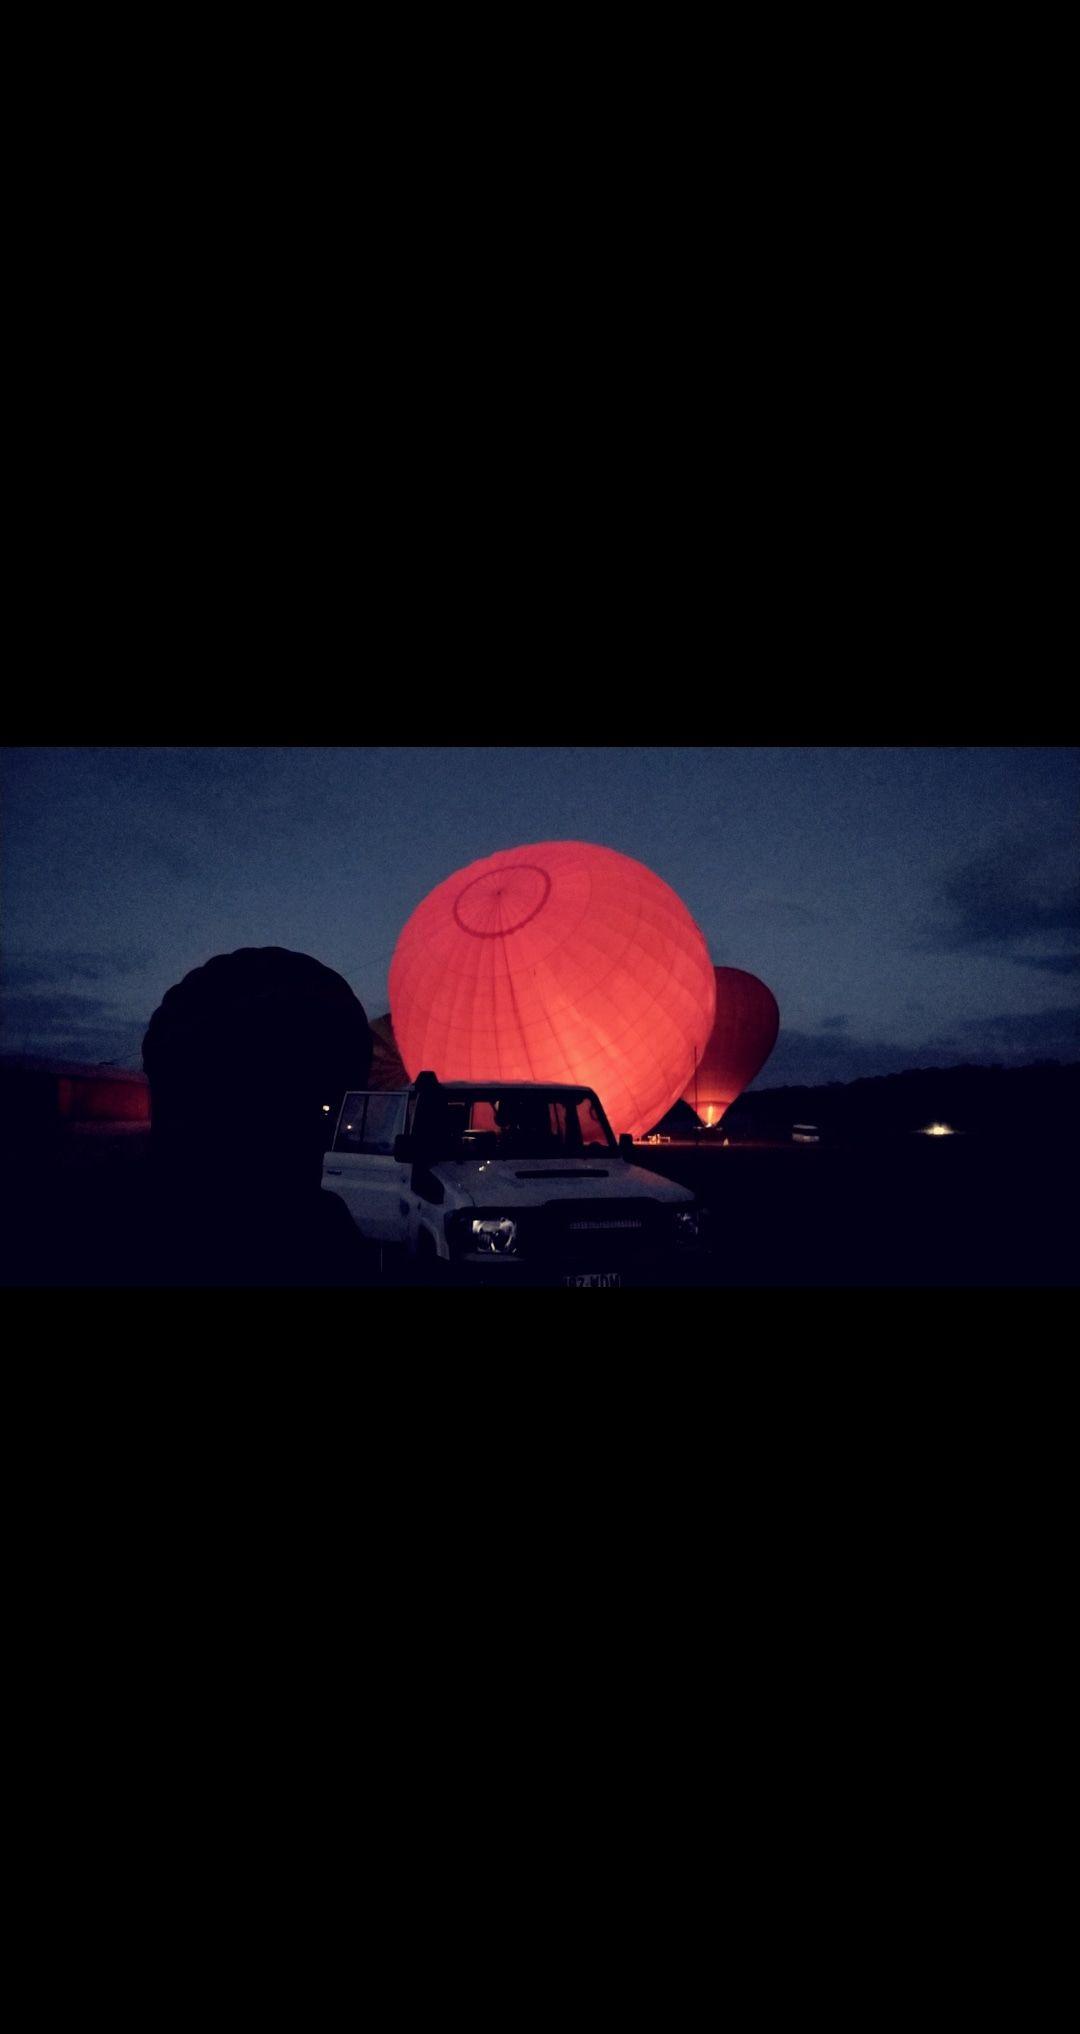 Photo of Hot Air Balloon Gold Coast By Shreya Jain